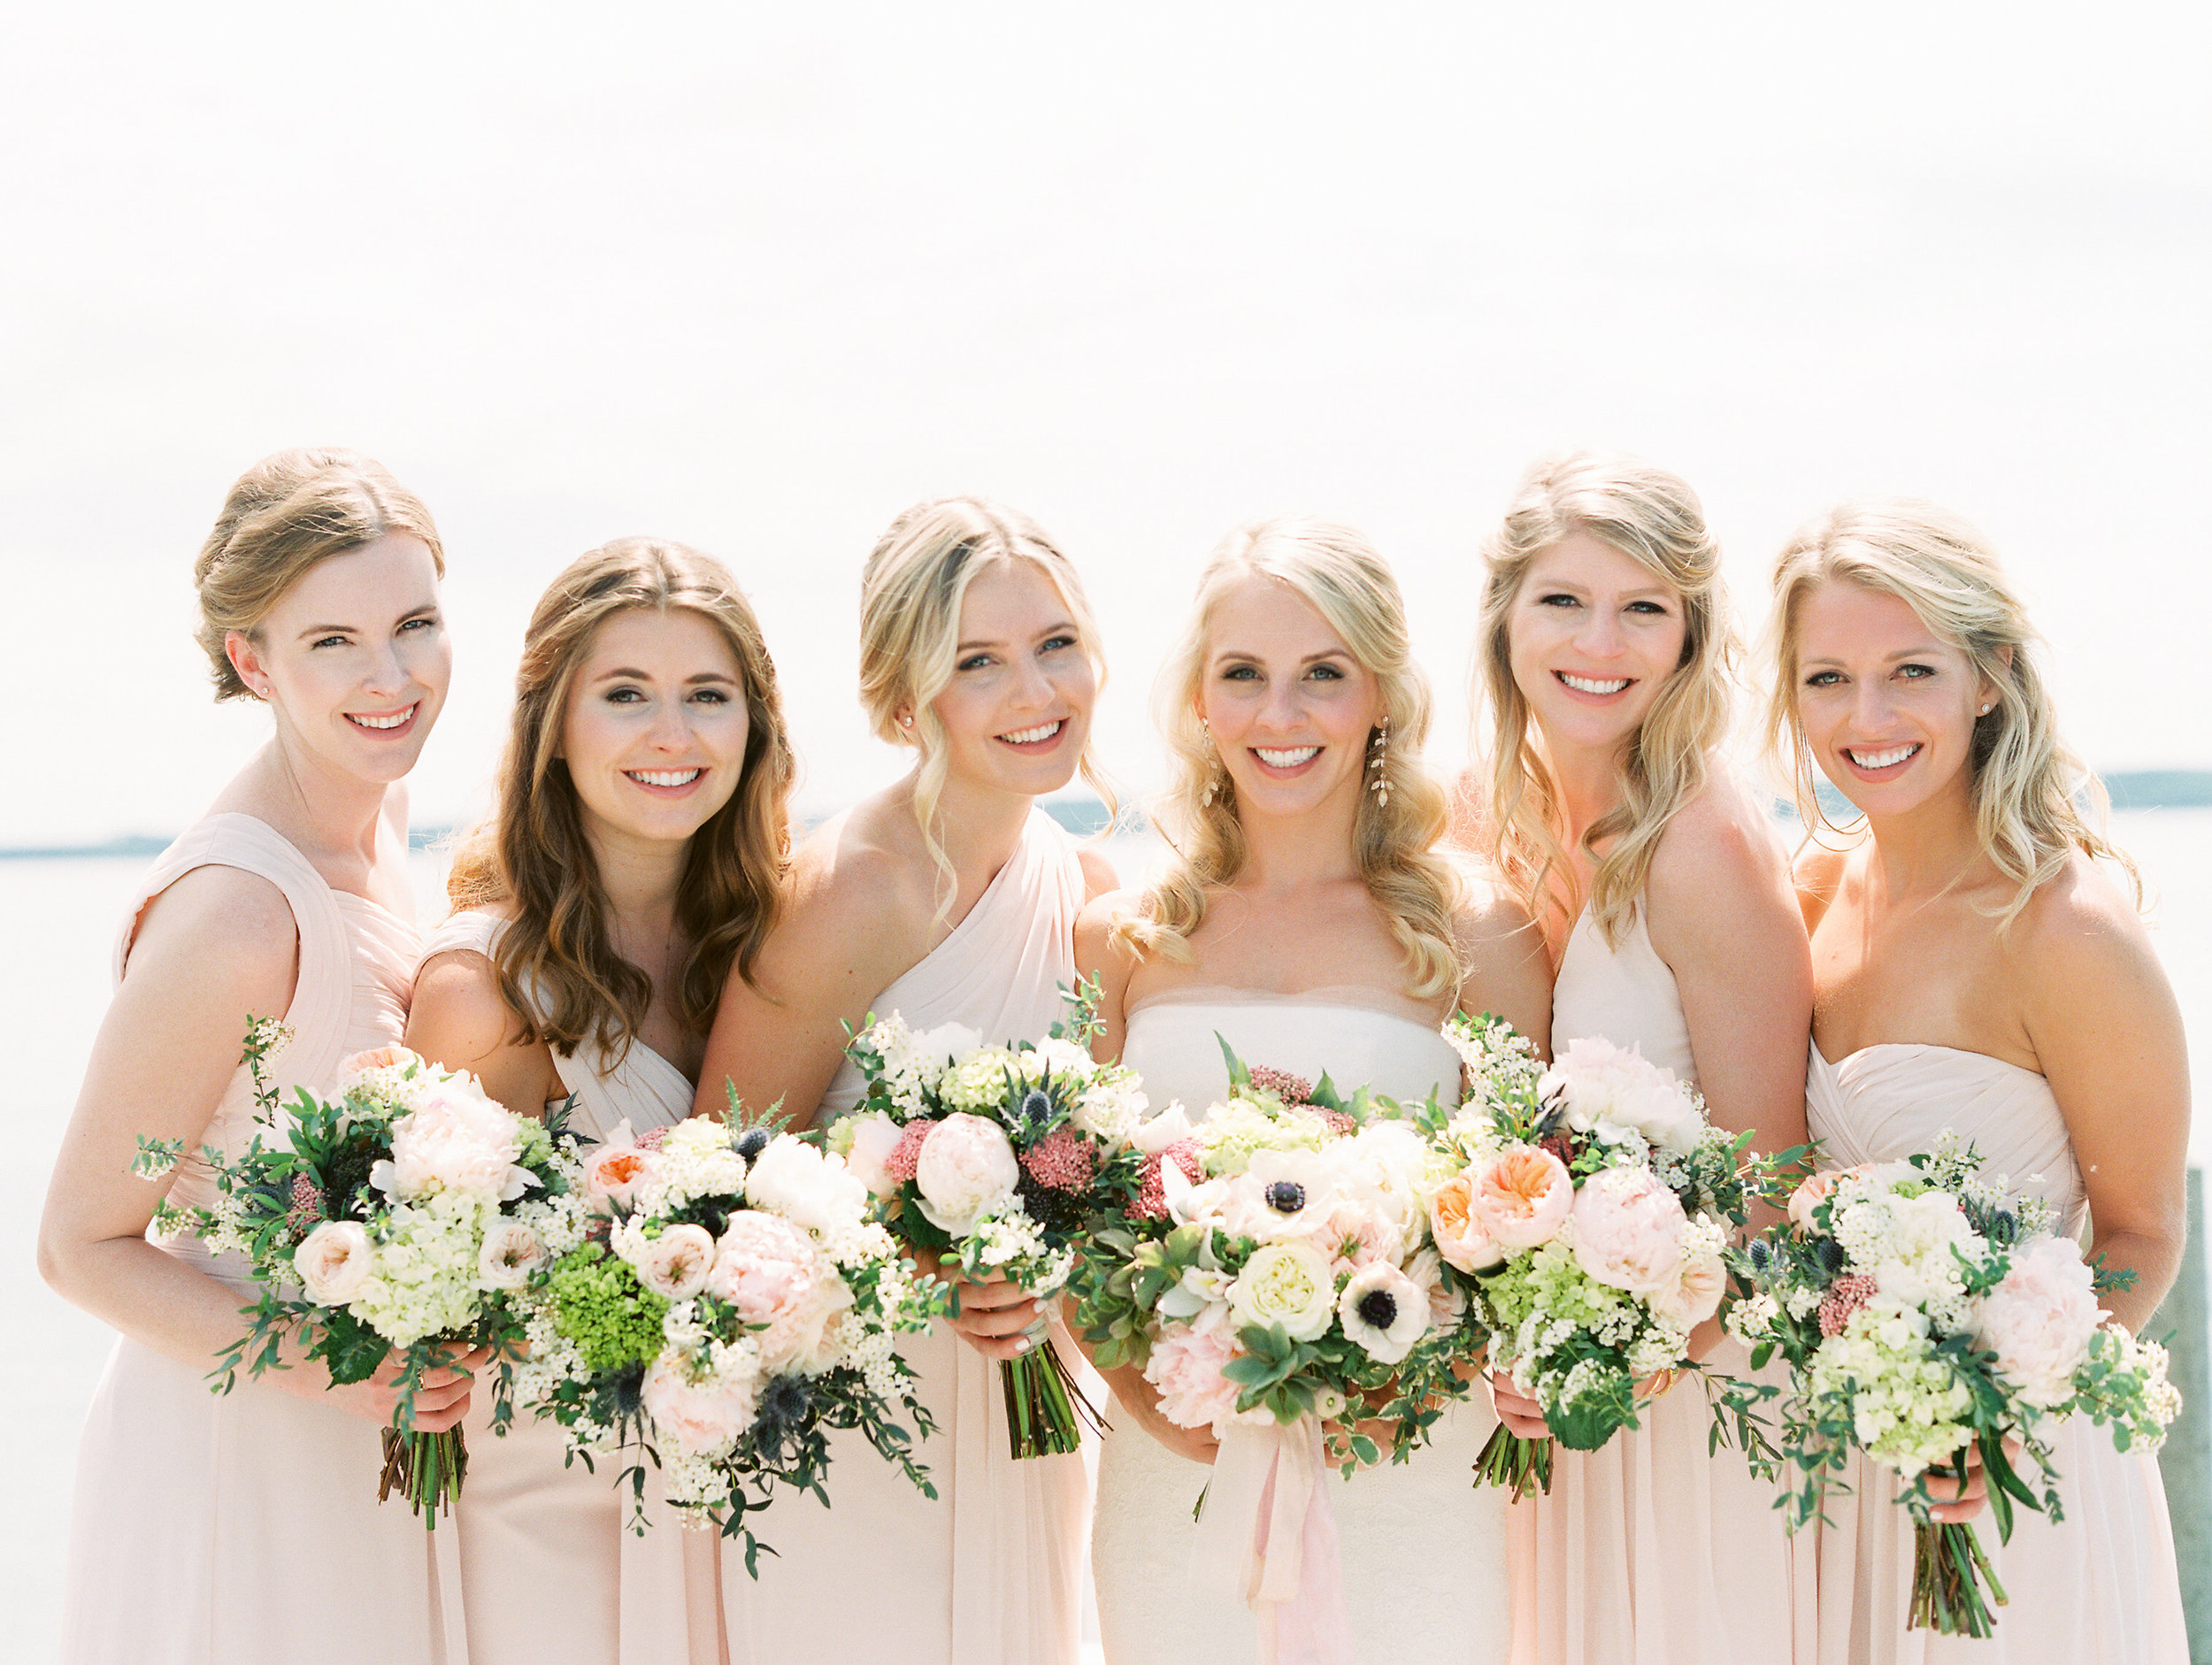 Coffman+Wedding+Bridal+Party-2.jpg